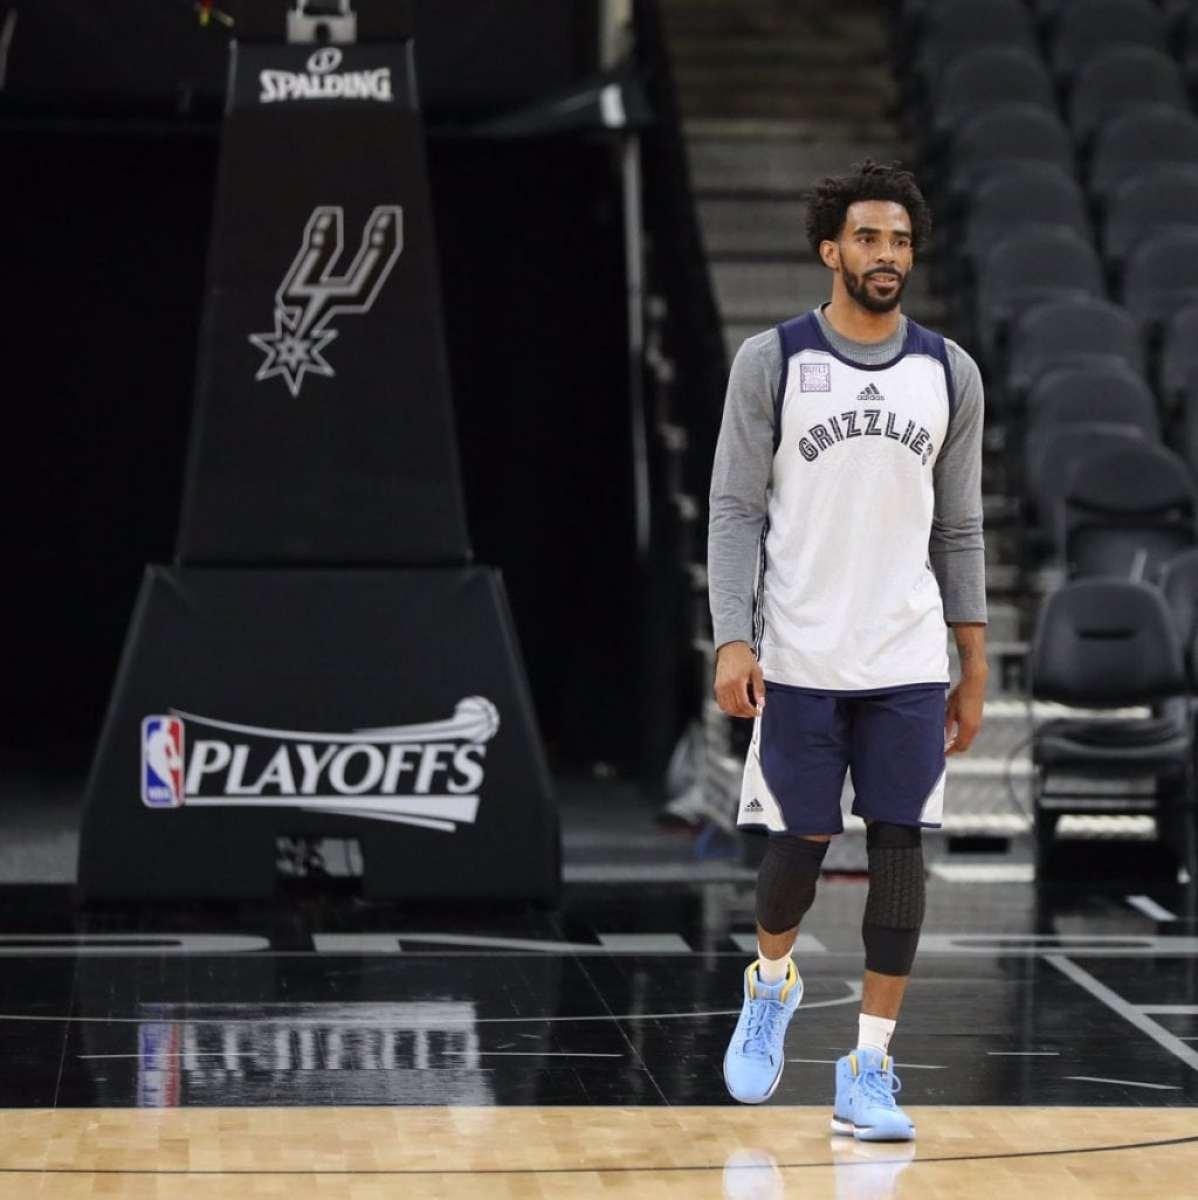 NBA Playoffs, Memphis Grizzlies, Mike Conley